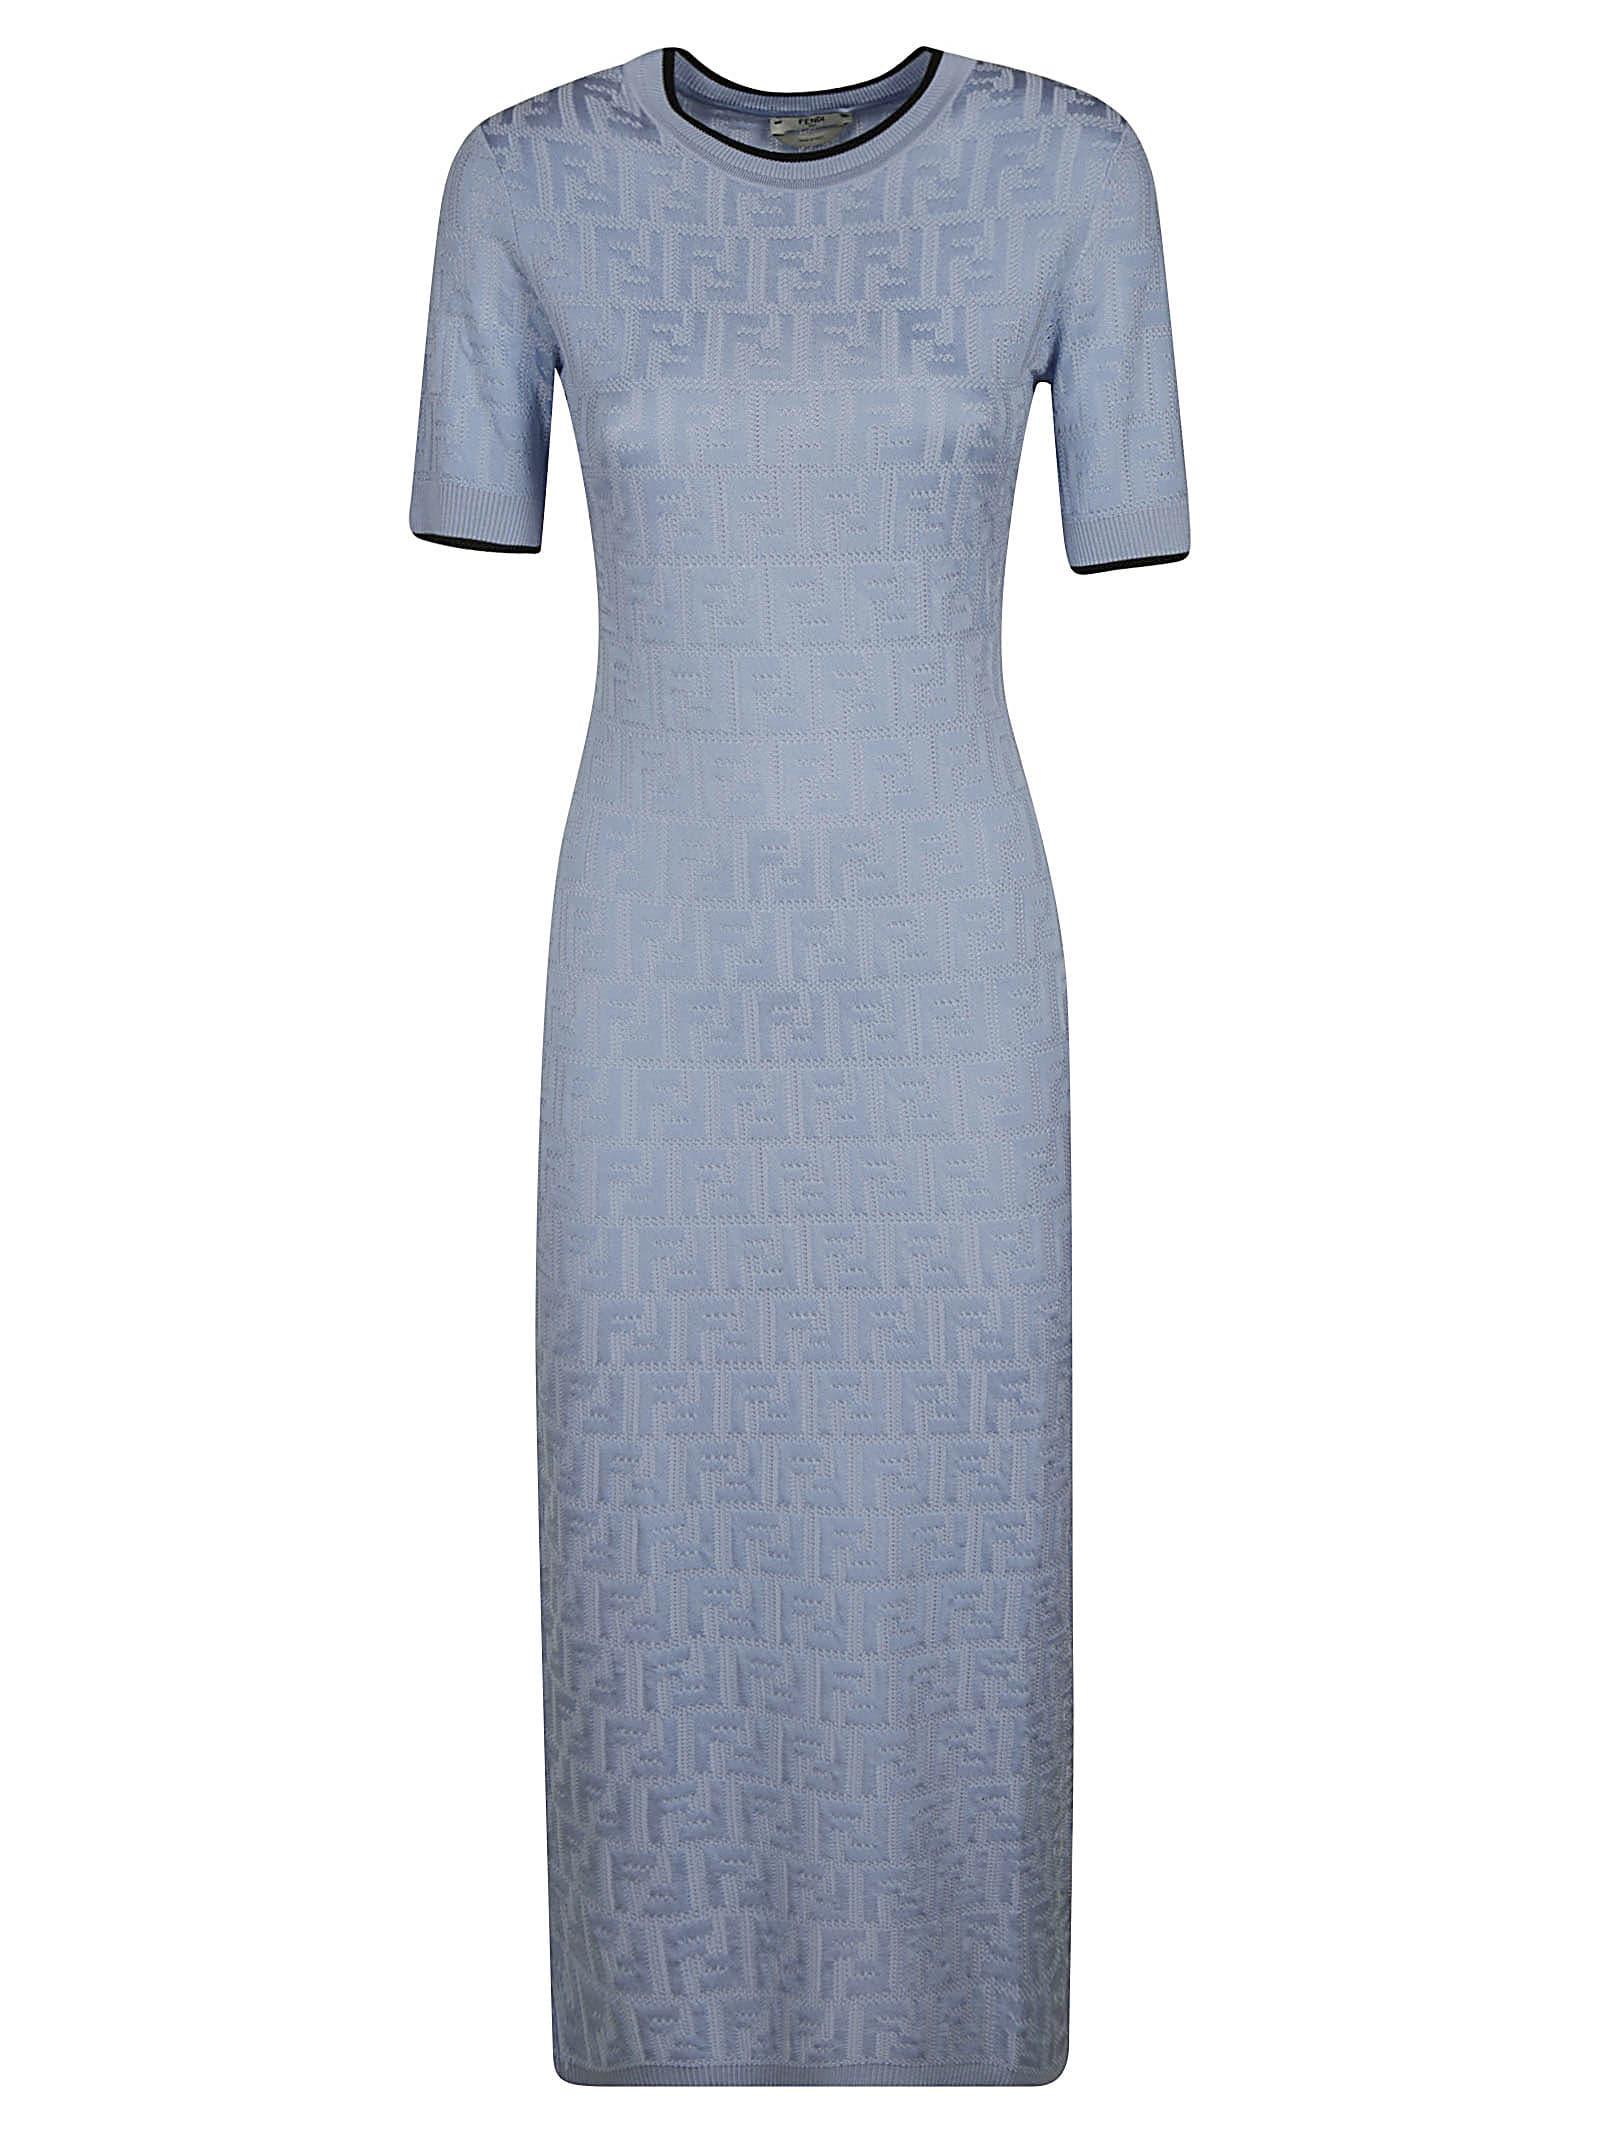 Fendi SLIM LOGO PATTERNED DRESS